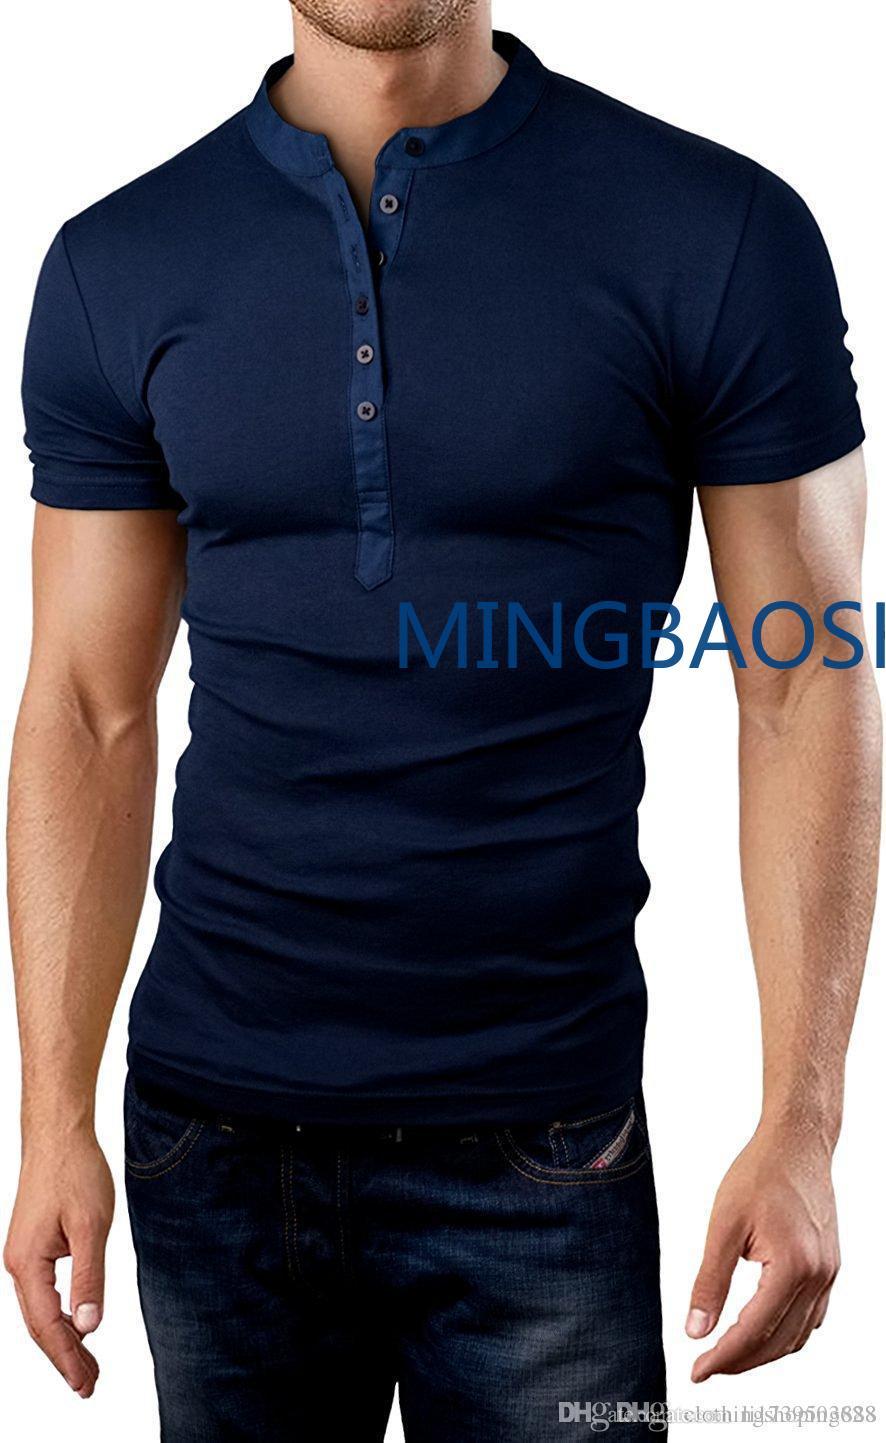 new style eda92 d1419 US $14.97 25% OFF Mens Luxury Designer Brand Shorts Sleeve V T Shirts for  men wrestling Herren T shirts mens T Shirt plus size men clothing 4xl-in ...